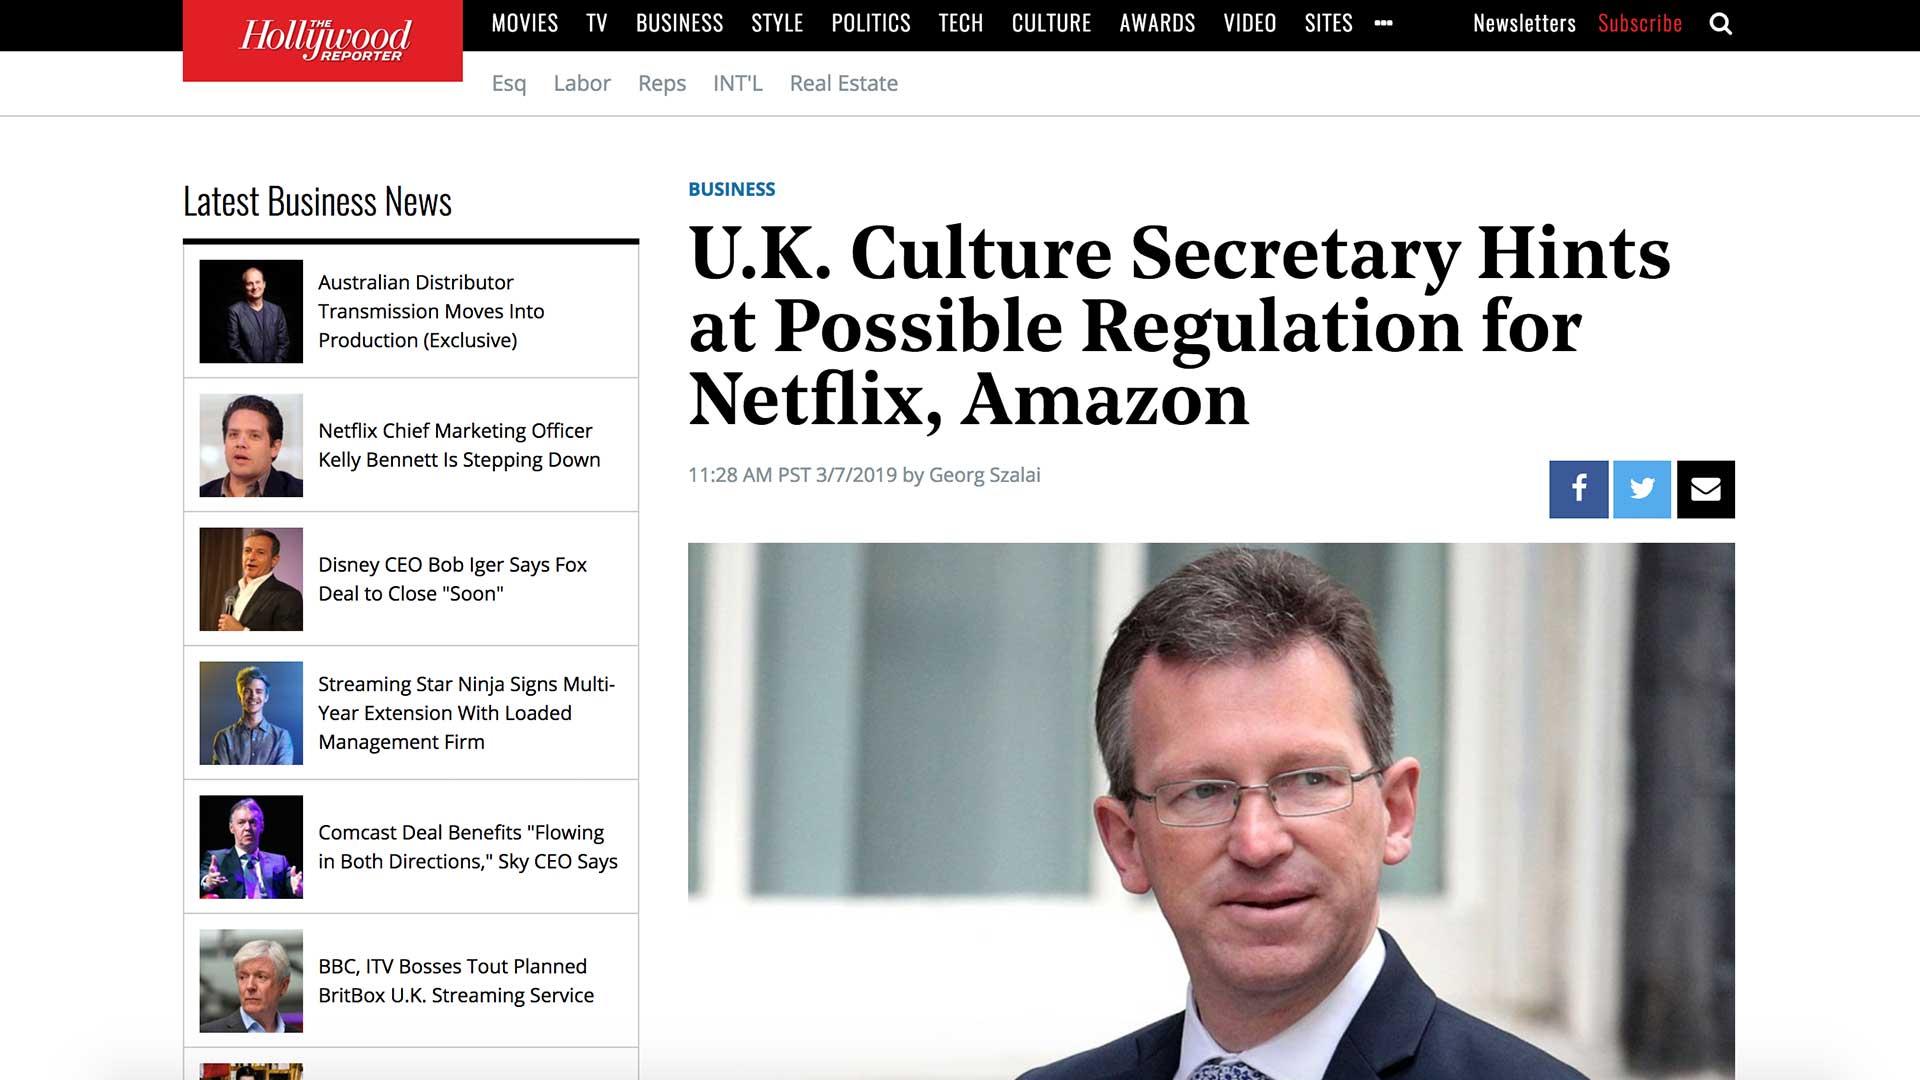 Fairness Rocks News U.K. Culture Secretary Hints at Possible Regulation for Netflix, Amazon